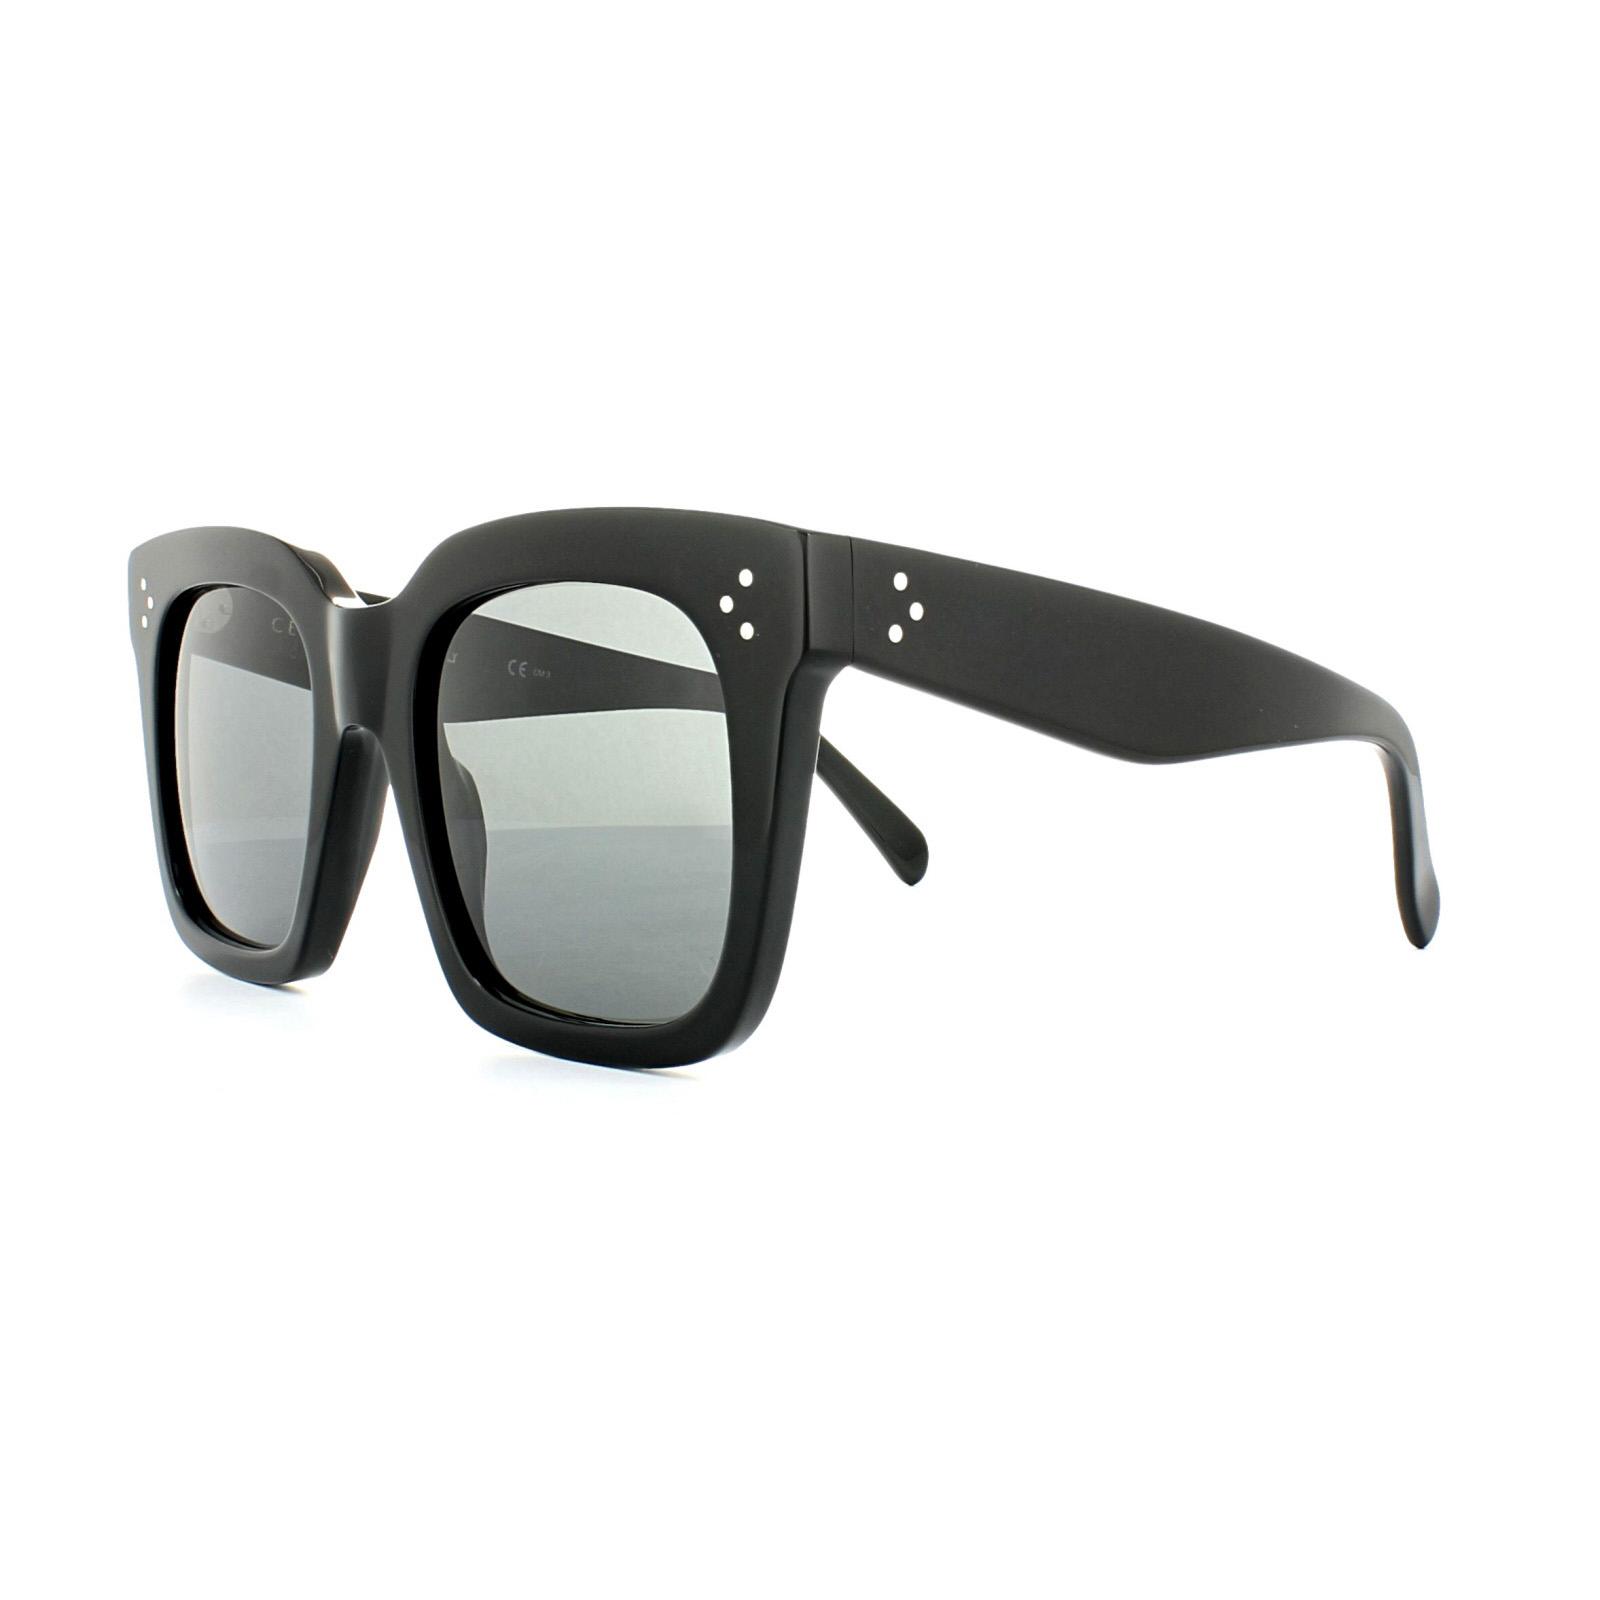 002d6948ba21d Cheap Celine 41076 S Tilda Sunglasses - Discounted Sunglasses